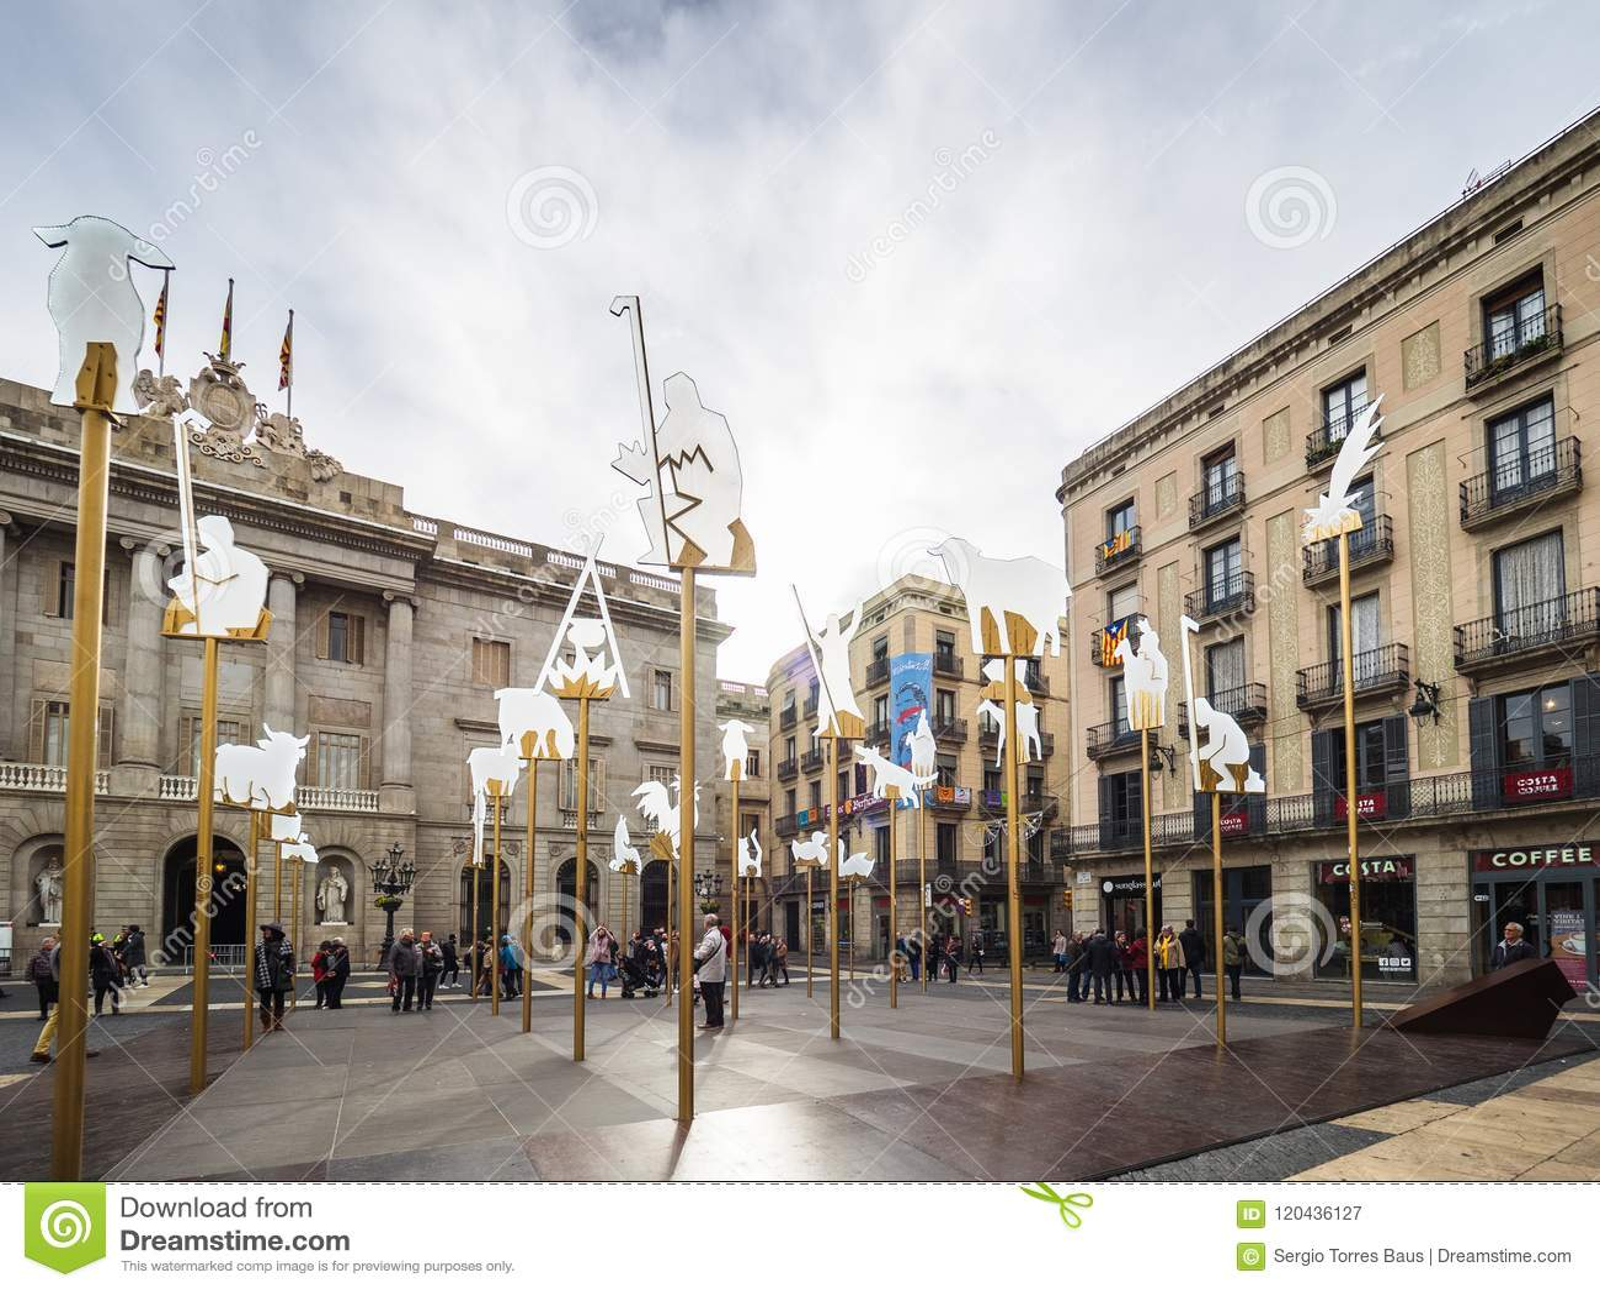 The Nativity scene in Sant Jaume square